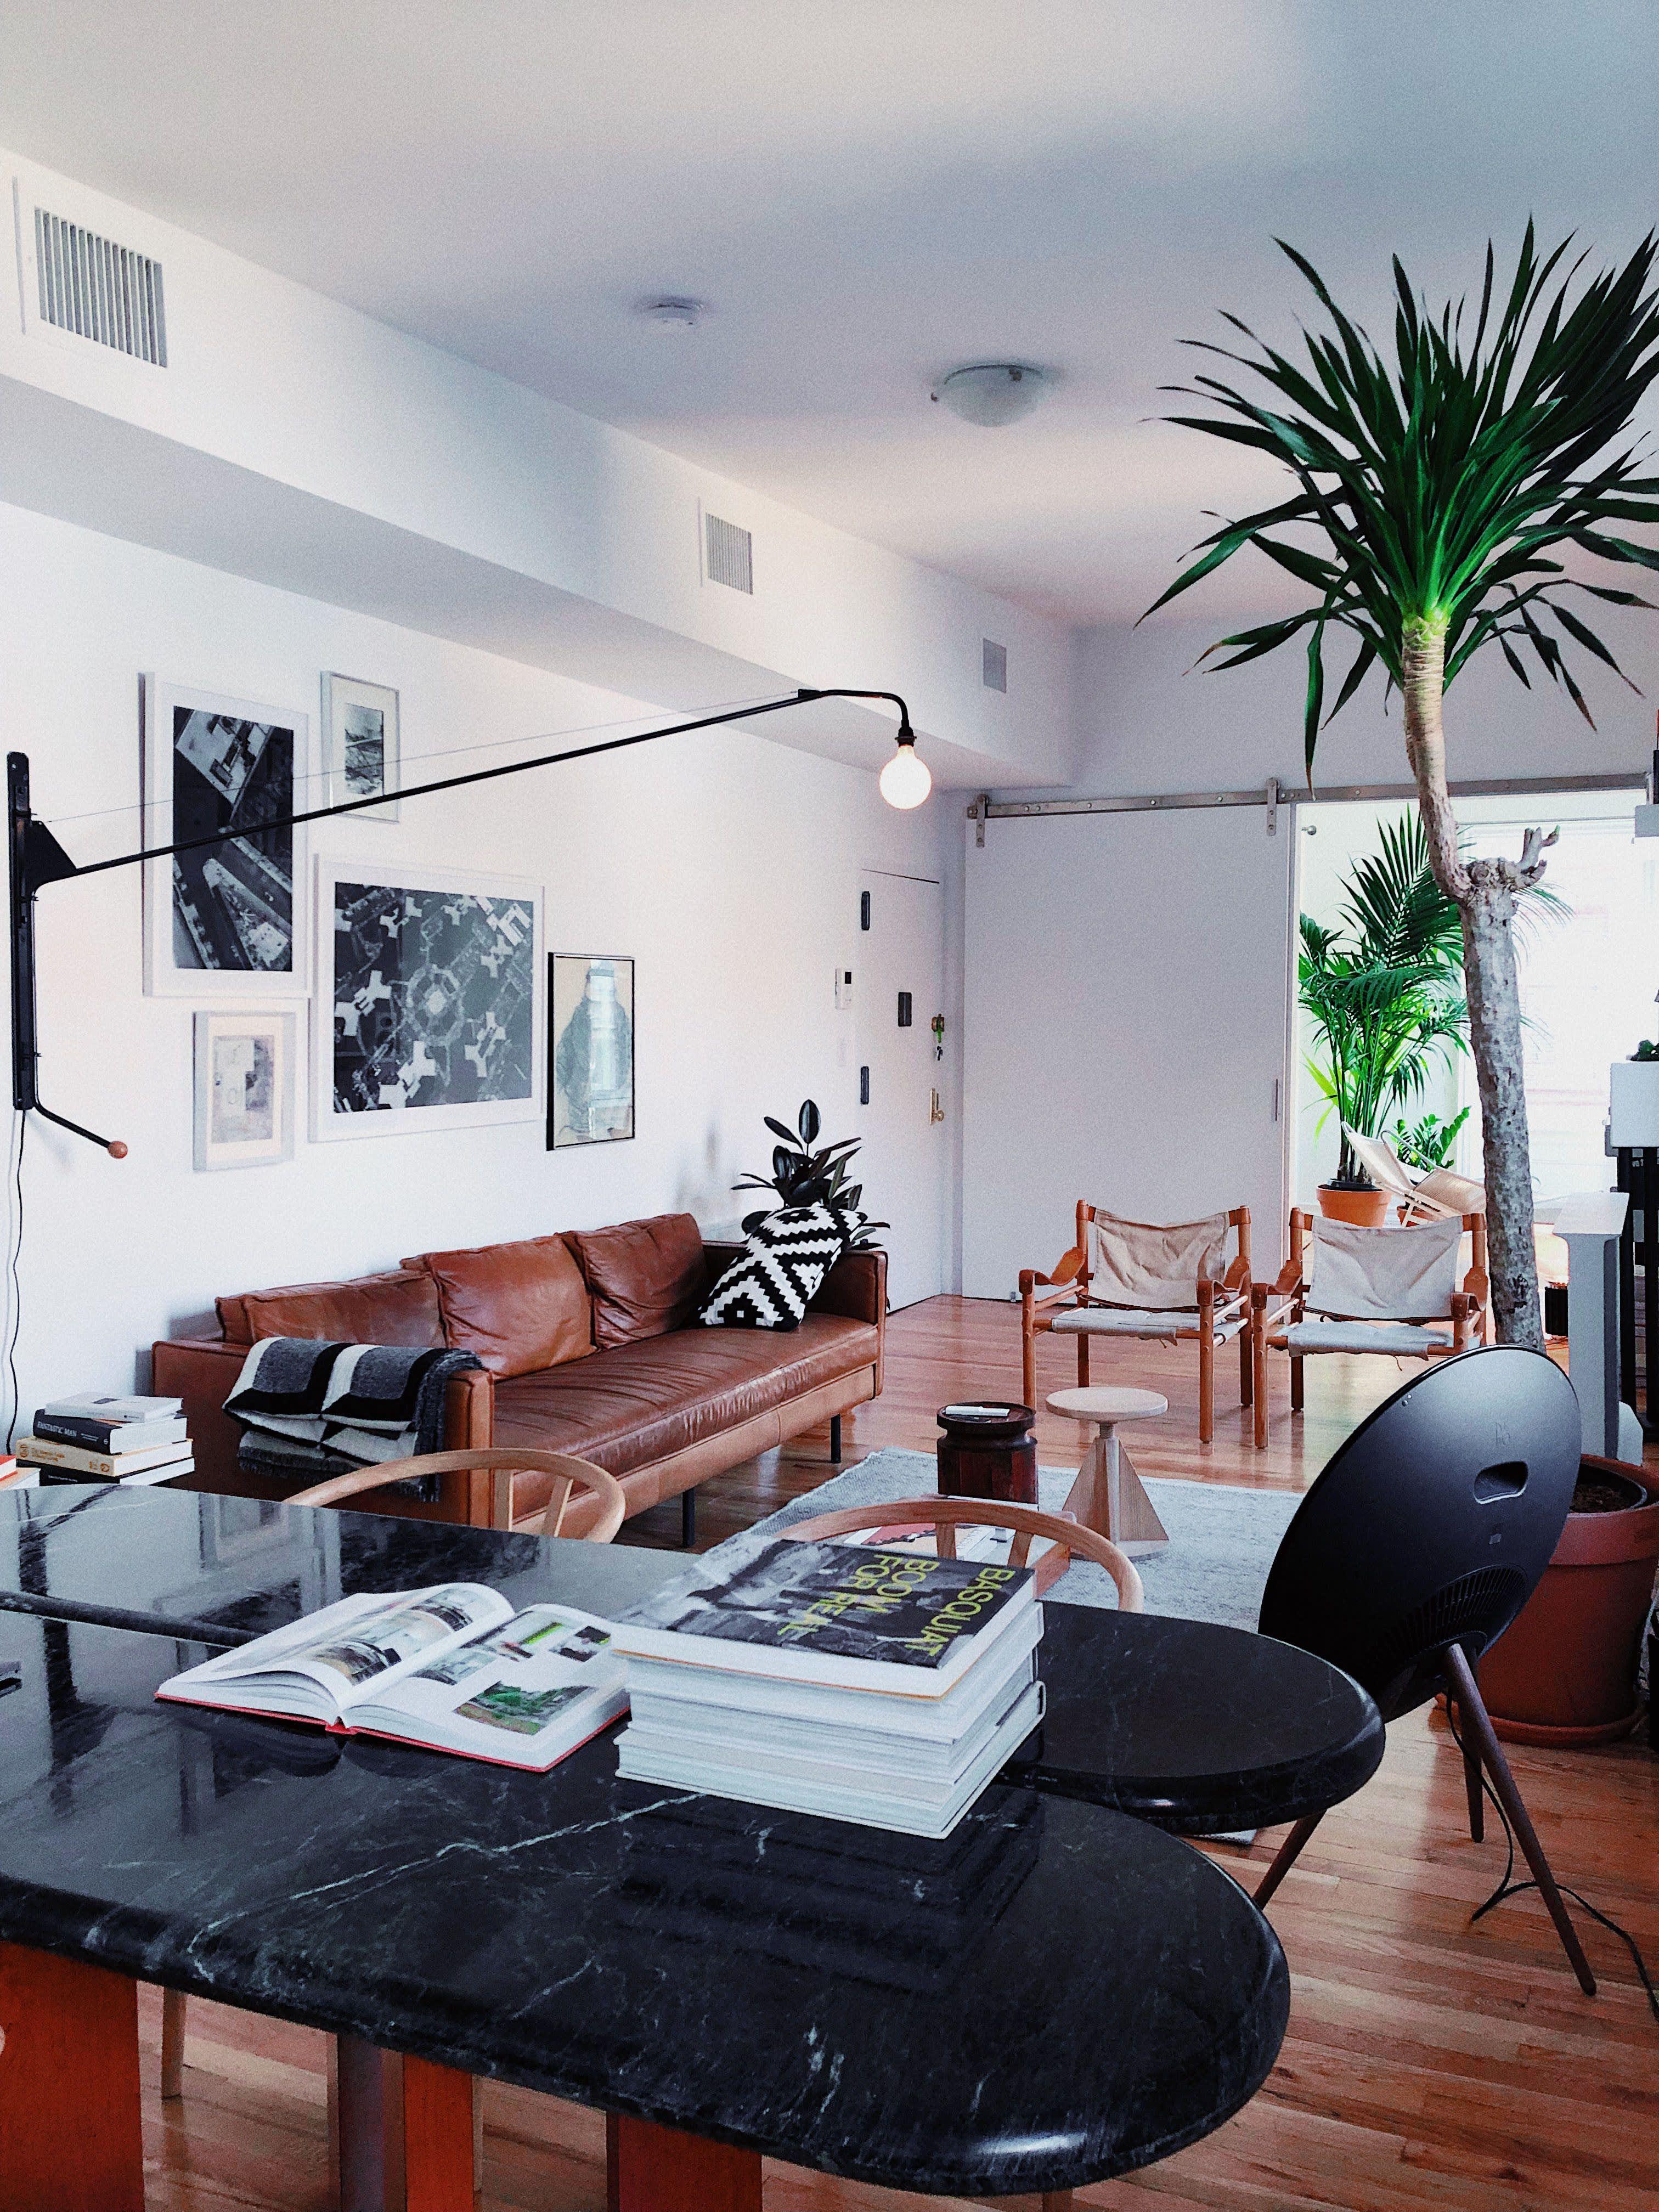 Behold Big Plants Beautiful Views And Bold Brick In This Sleek Nyc Loft Living Room Loft Small Living Room Decor Brick Wall Living Room